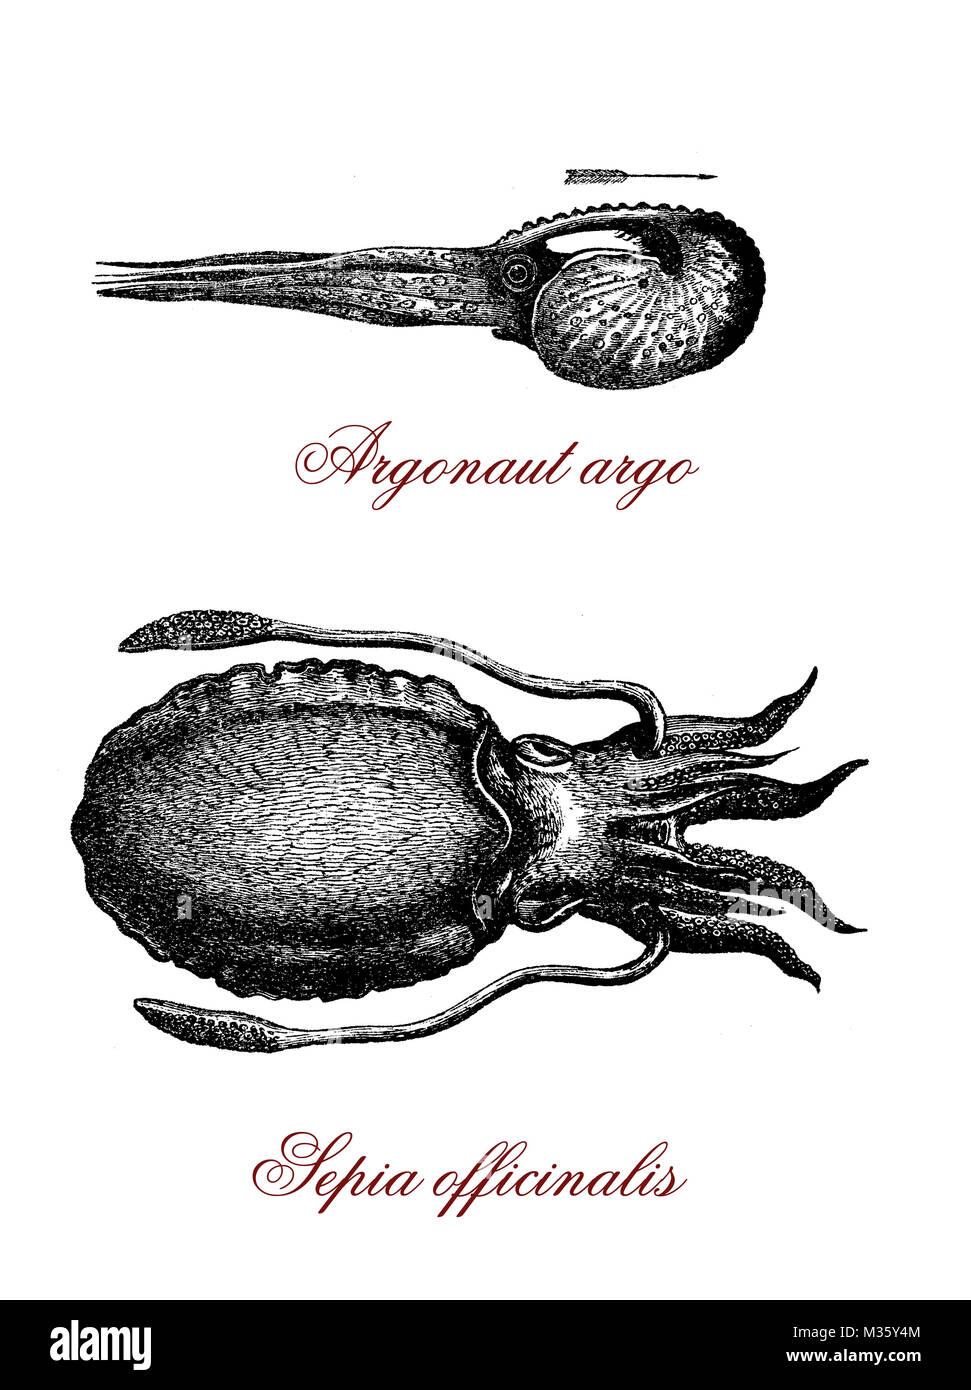 Vintage illustration of common cuttlefish and tropical argonauta argo octopus - Stock Image